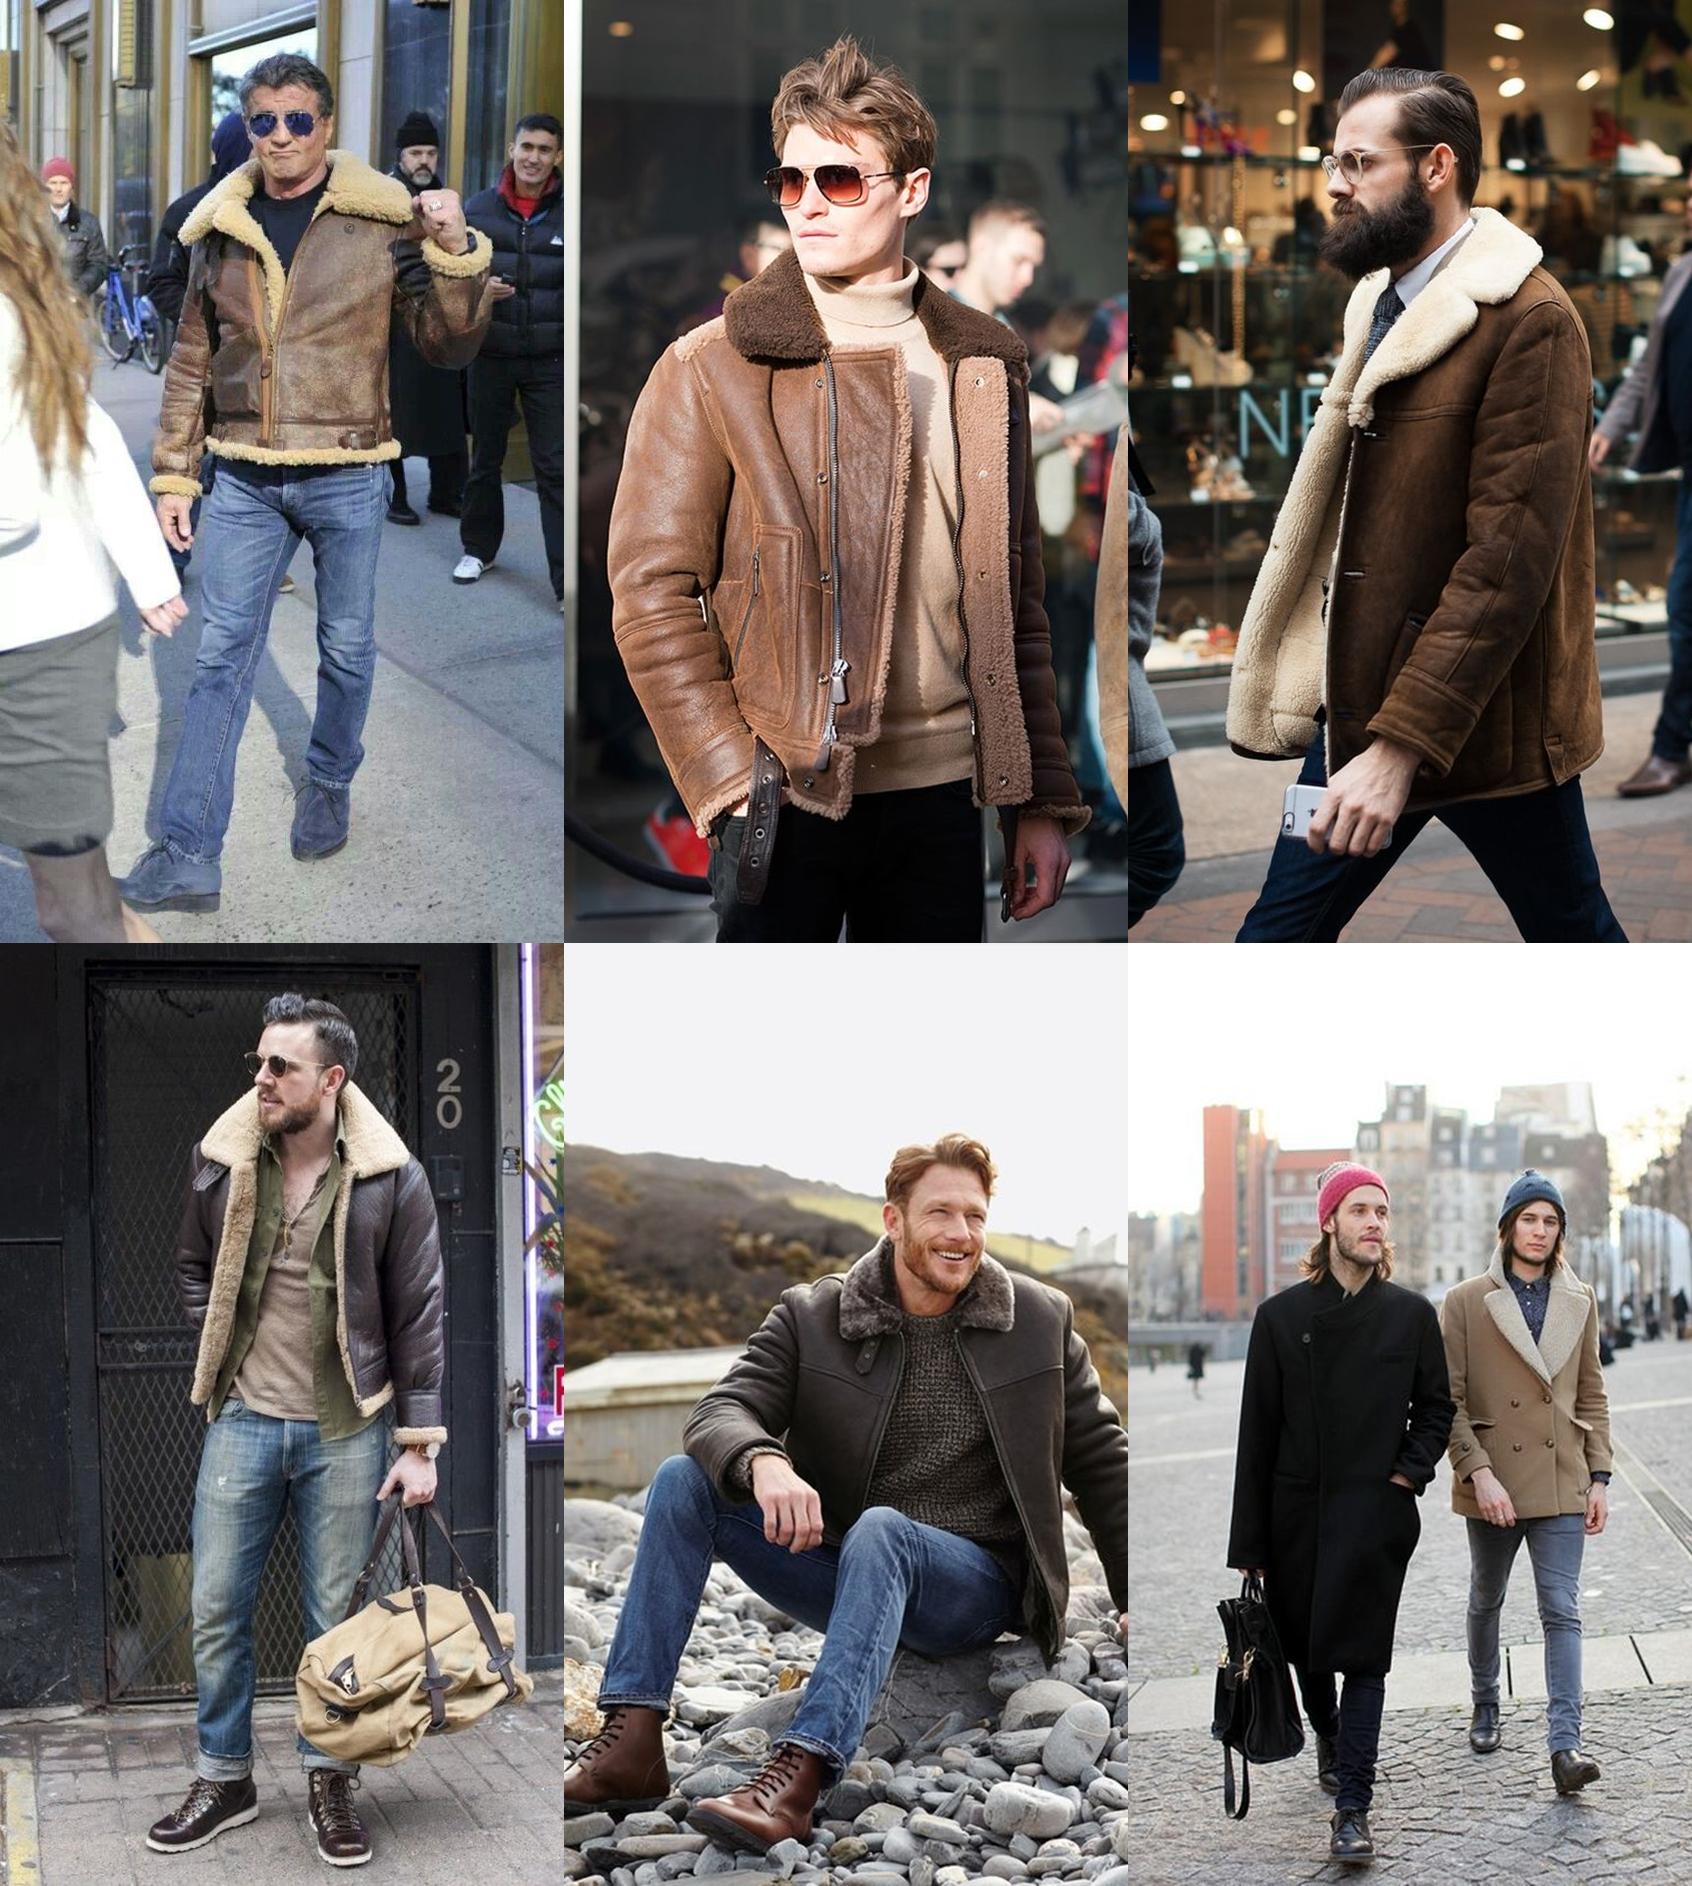 jaqueta pele de carneiro, jaqueta masculina, Sherpa Trucker Jacket. moda masculina, menswear, blogger, blog de moda, alex cursino, moda sem censura, dicas de moda, 5